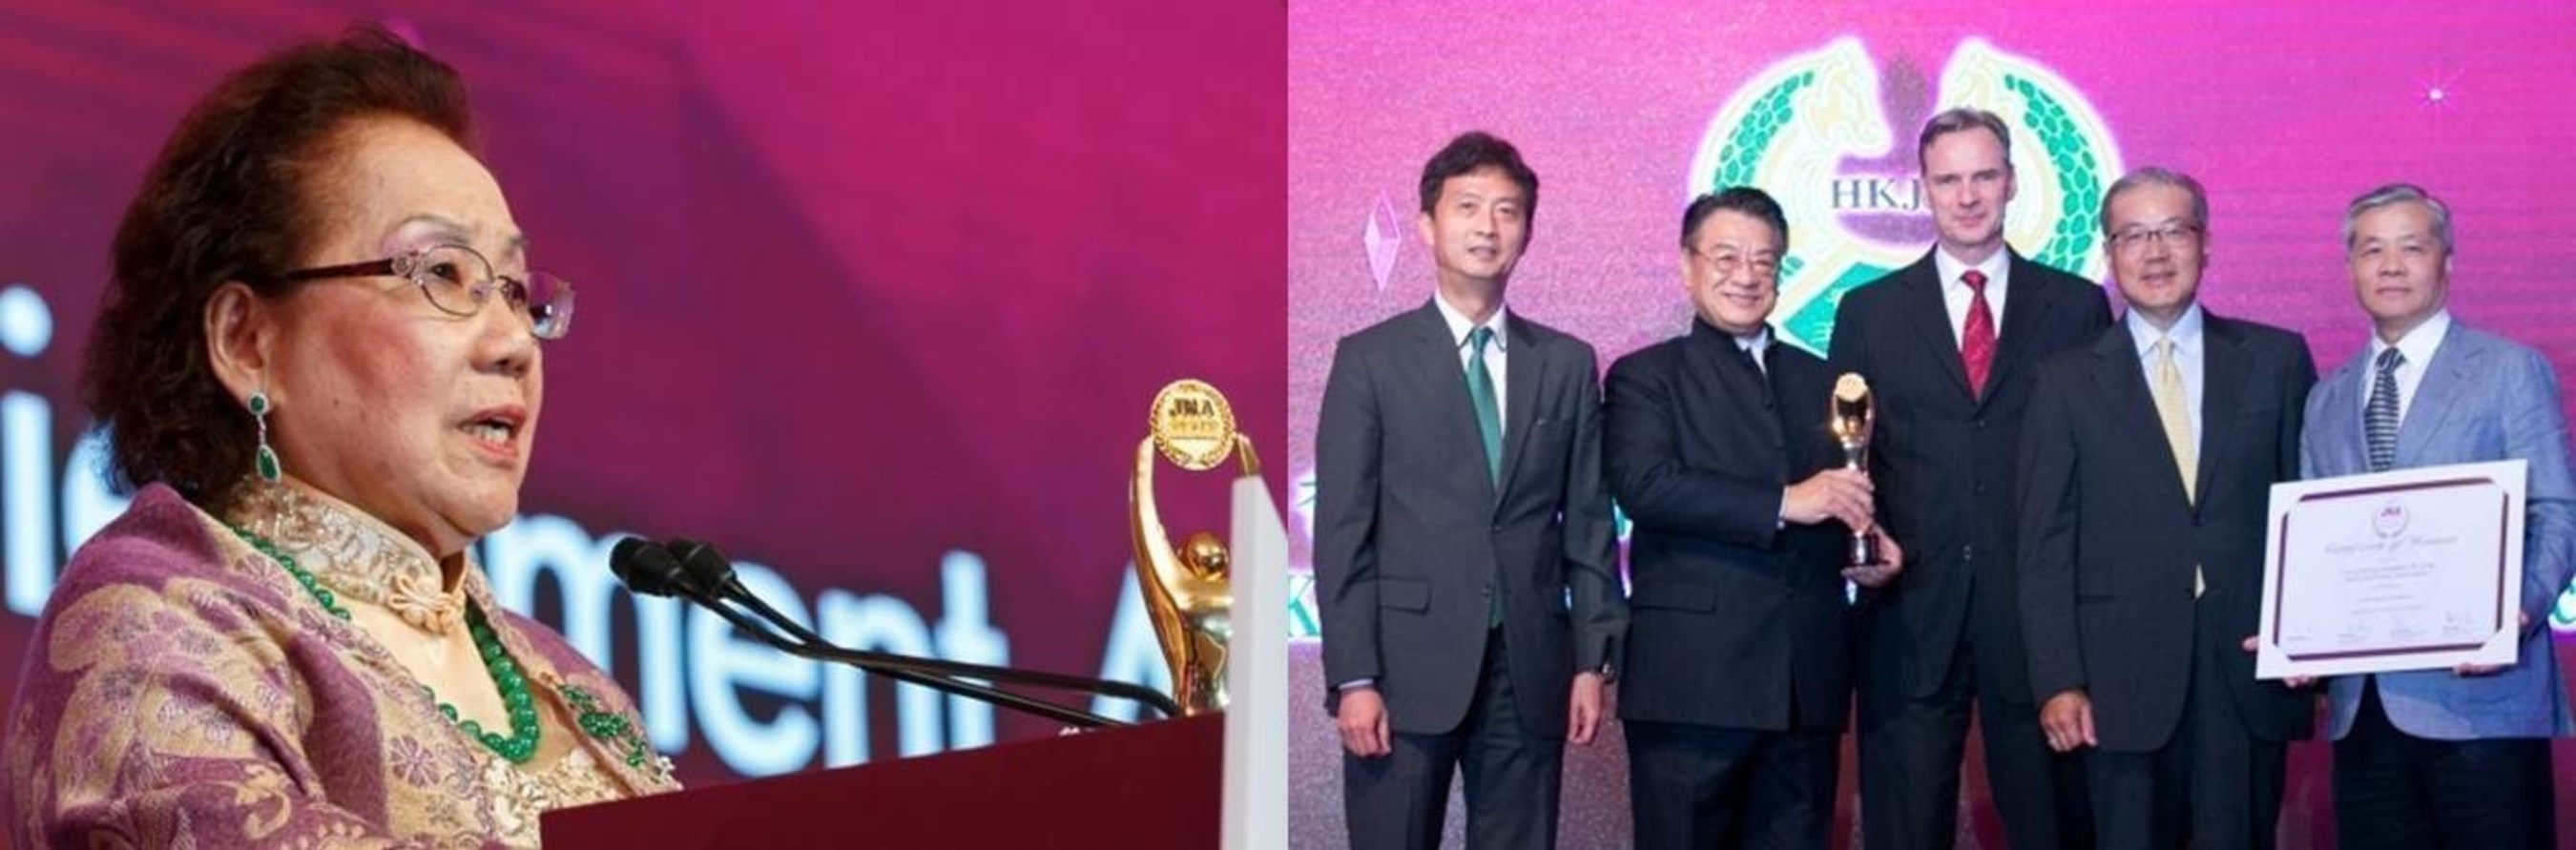 From left: Mimi Ou Yang Chiu Mei; representatives of the Hong Kong Jewellery & Jade Manufacturers Association